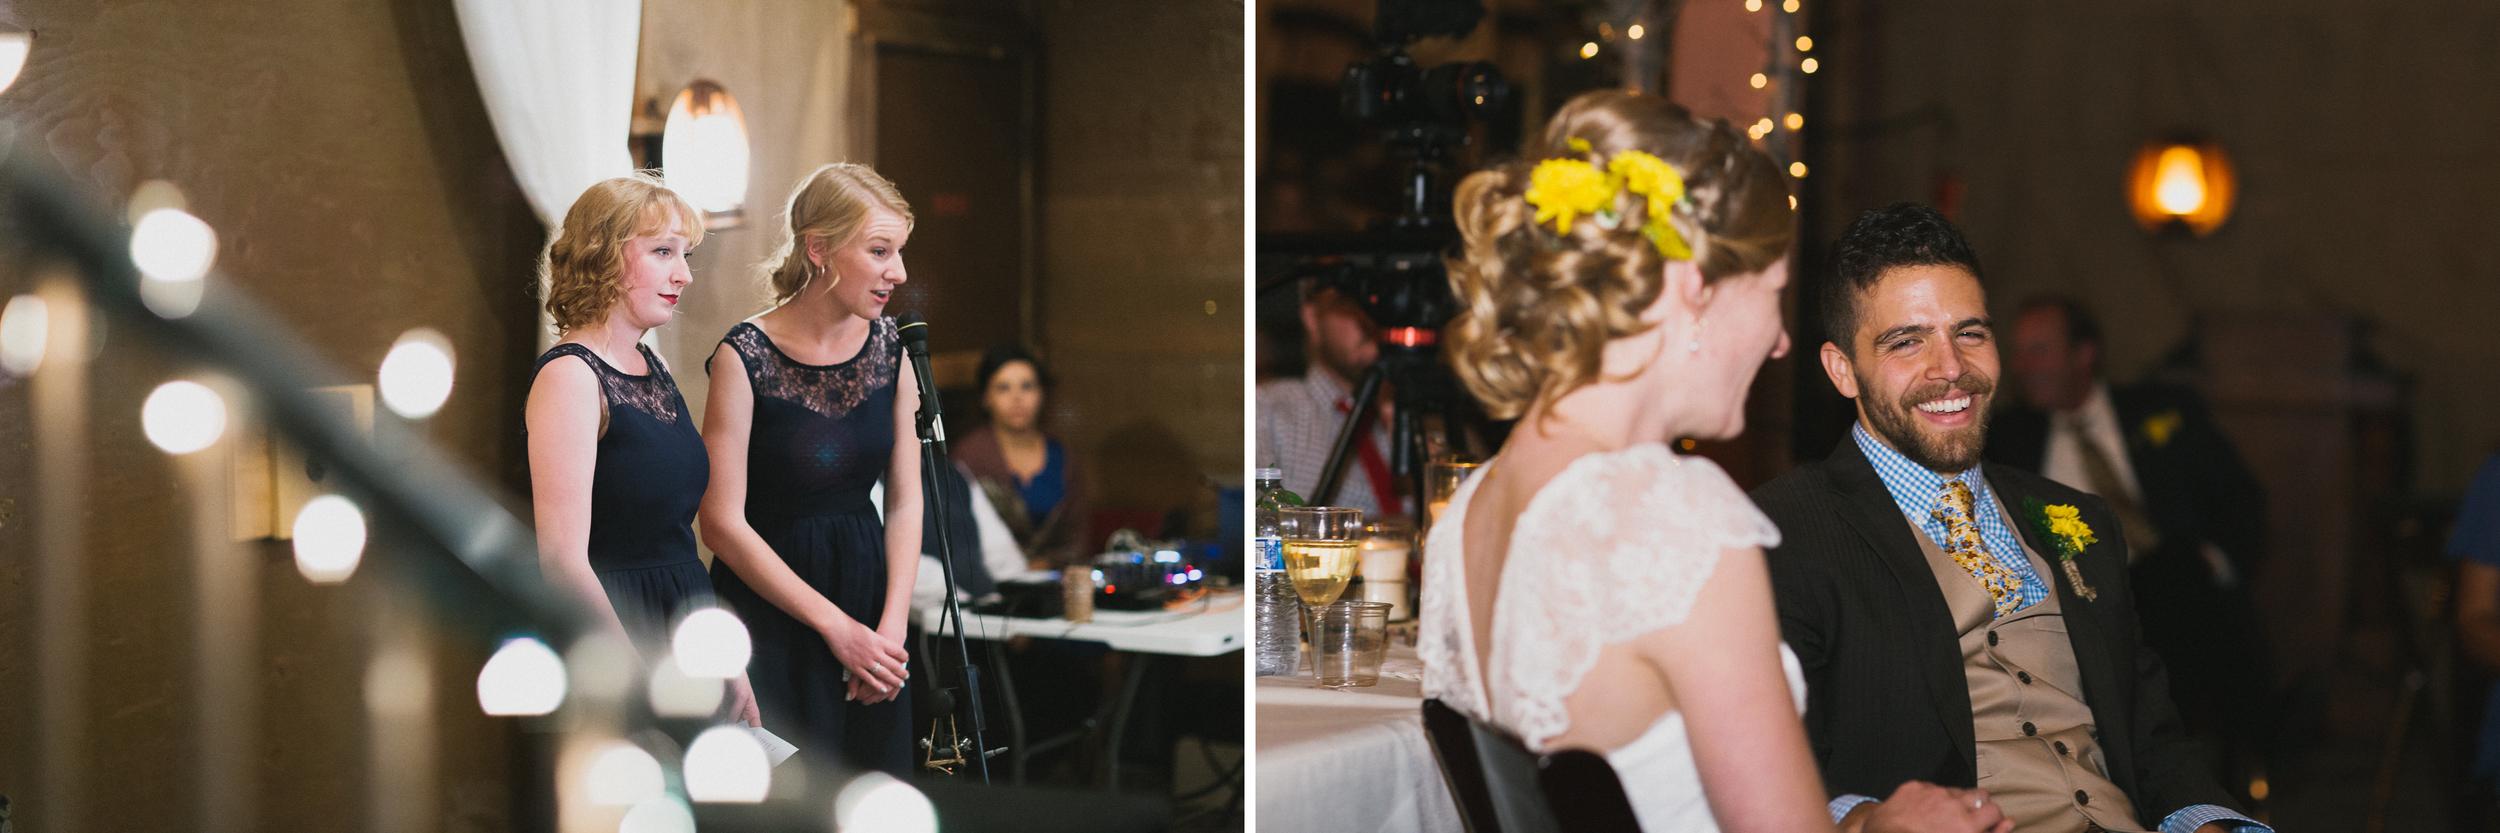 Salt-Lake-City-Wedding-Photographer-Utah-014.jpg